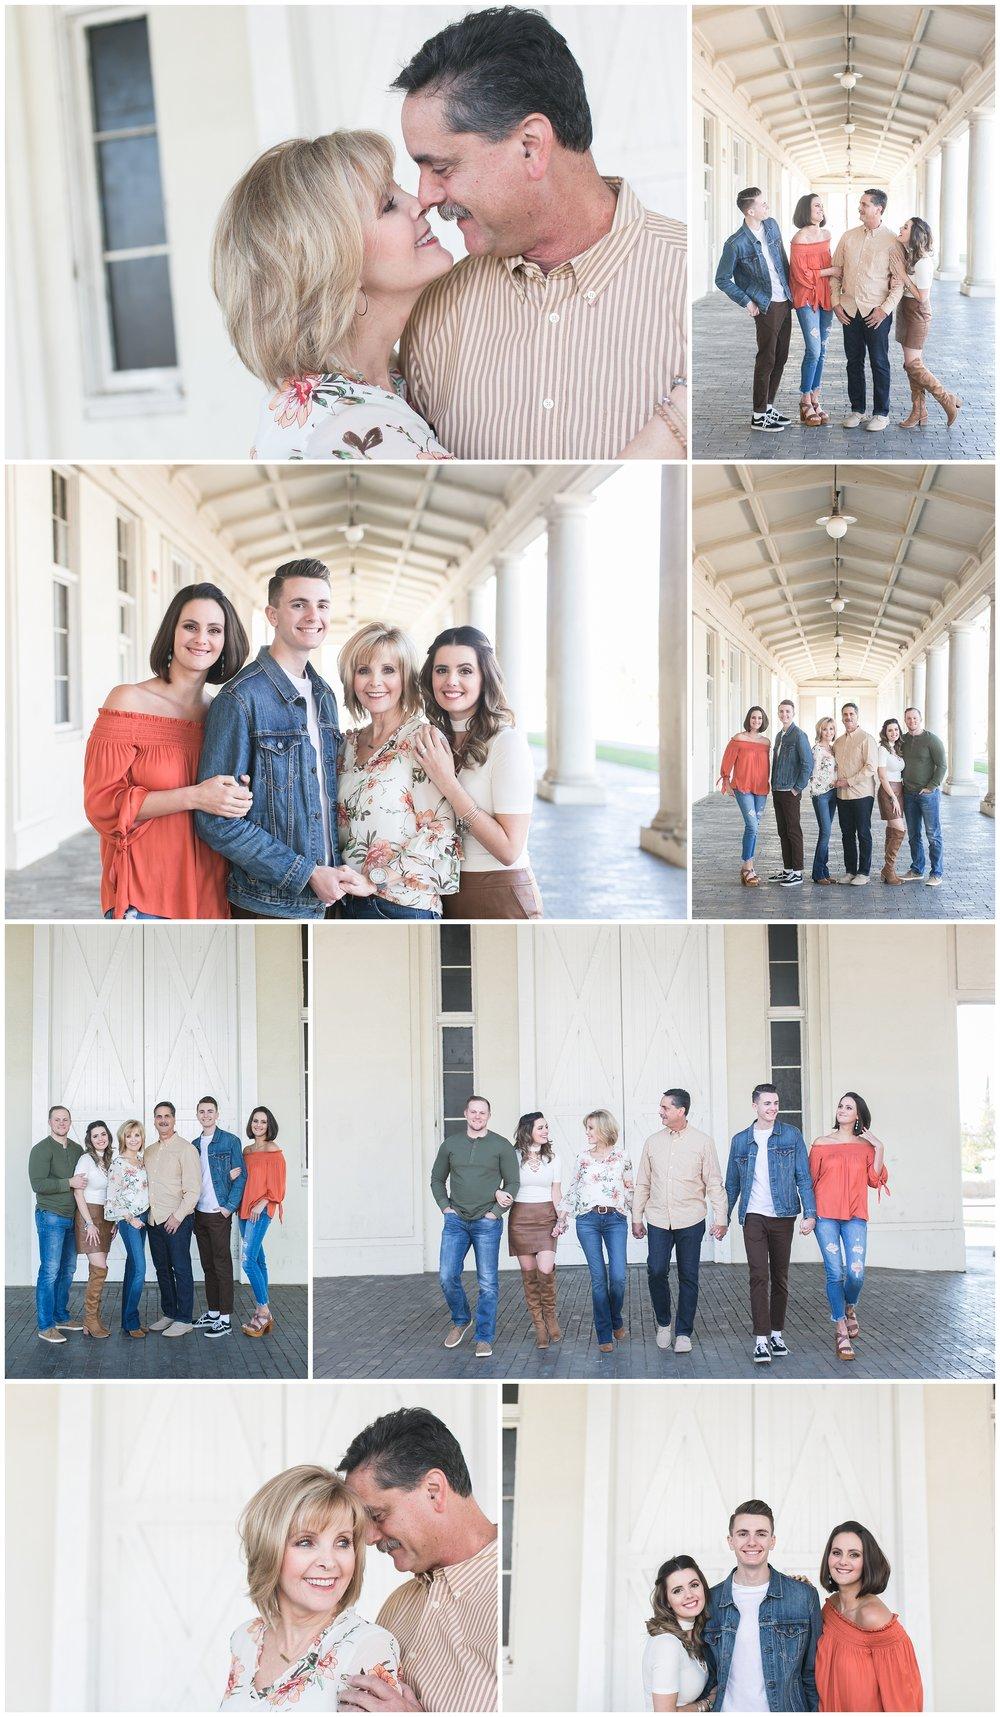 Historic Redlands Train Station Redlands Santa Fe Depot family photography session carrie vines